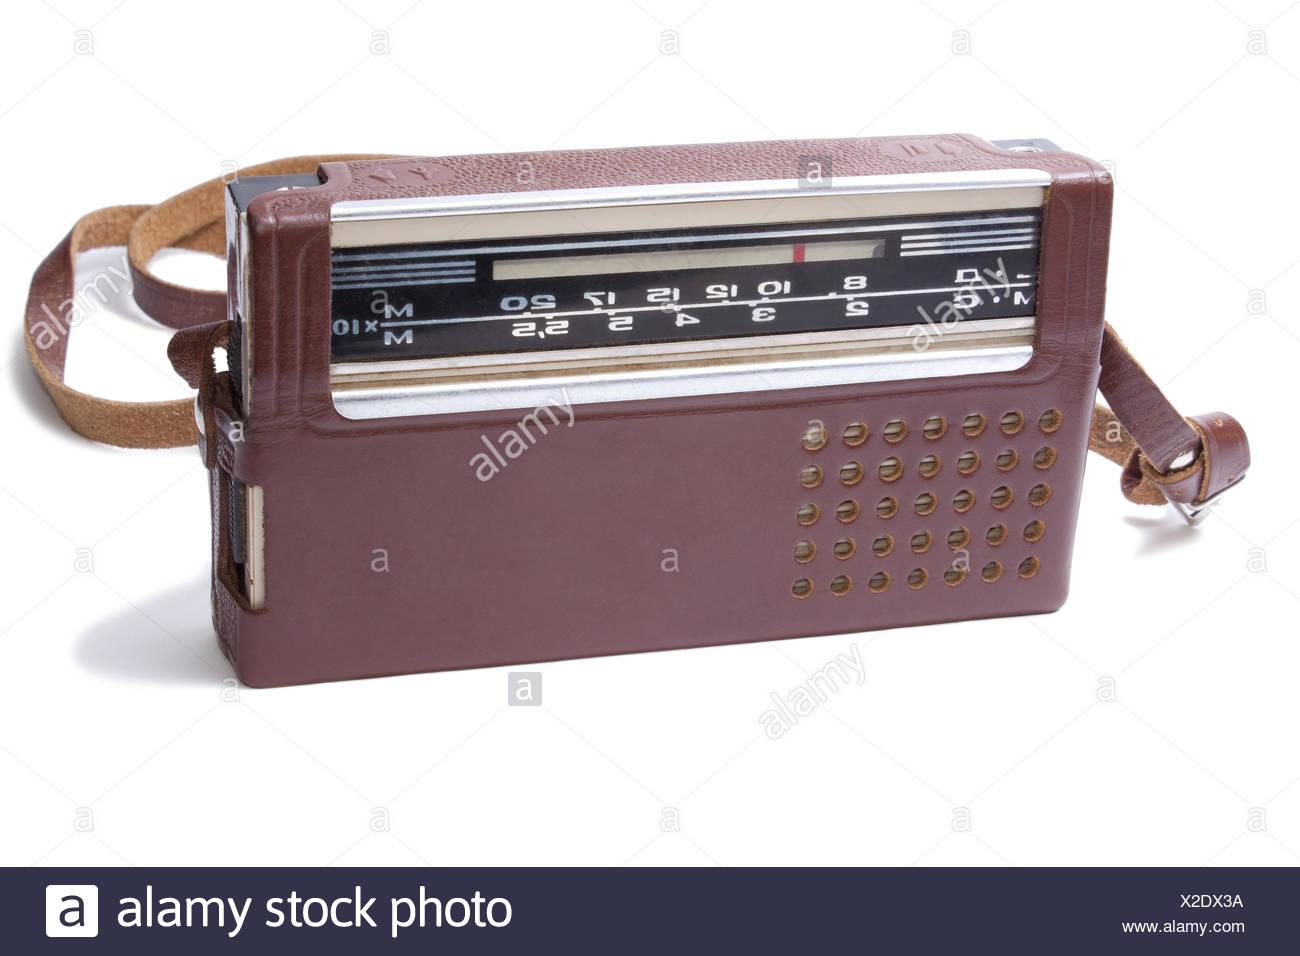 Old Transistor Radio Stock Photos & Old Transistor Radio Stock